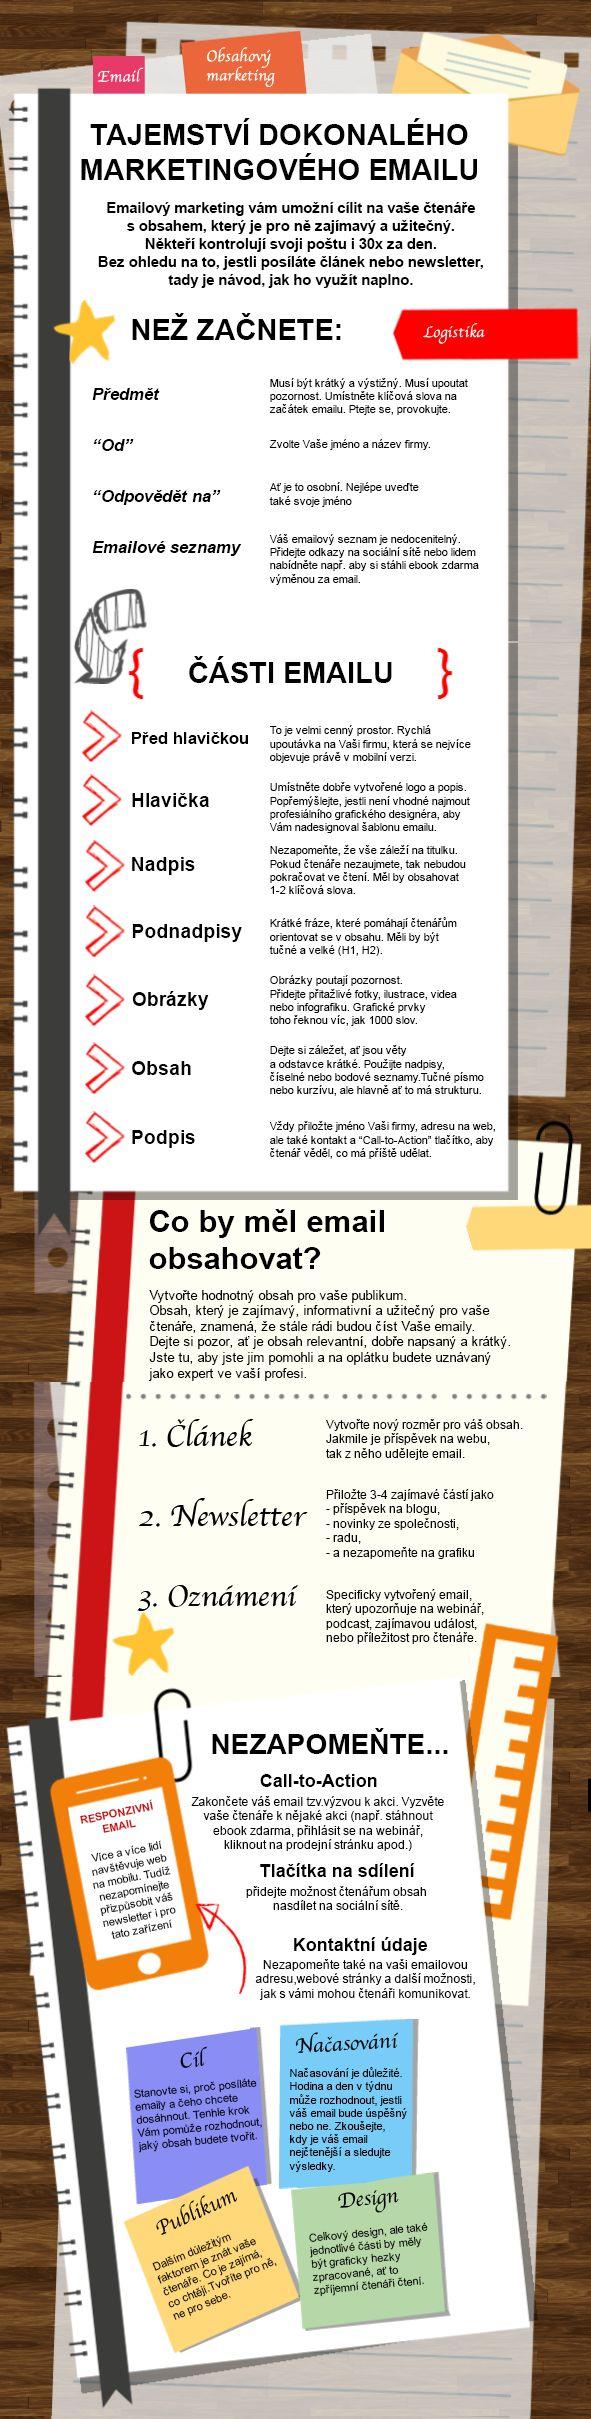 infografika_tajemstvi_dokonaleho_emailu